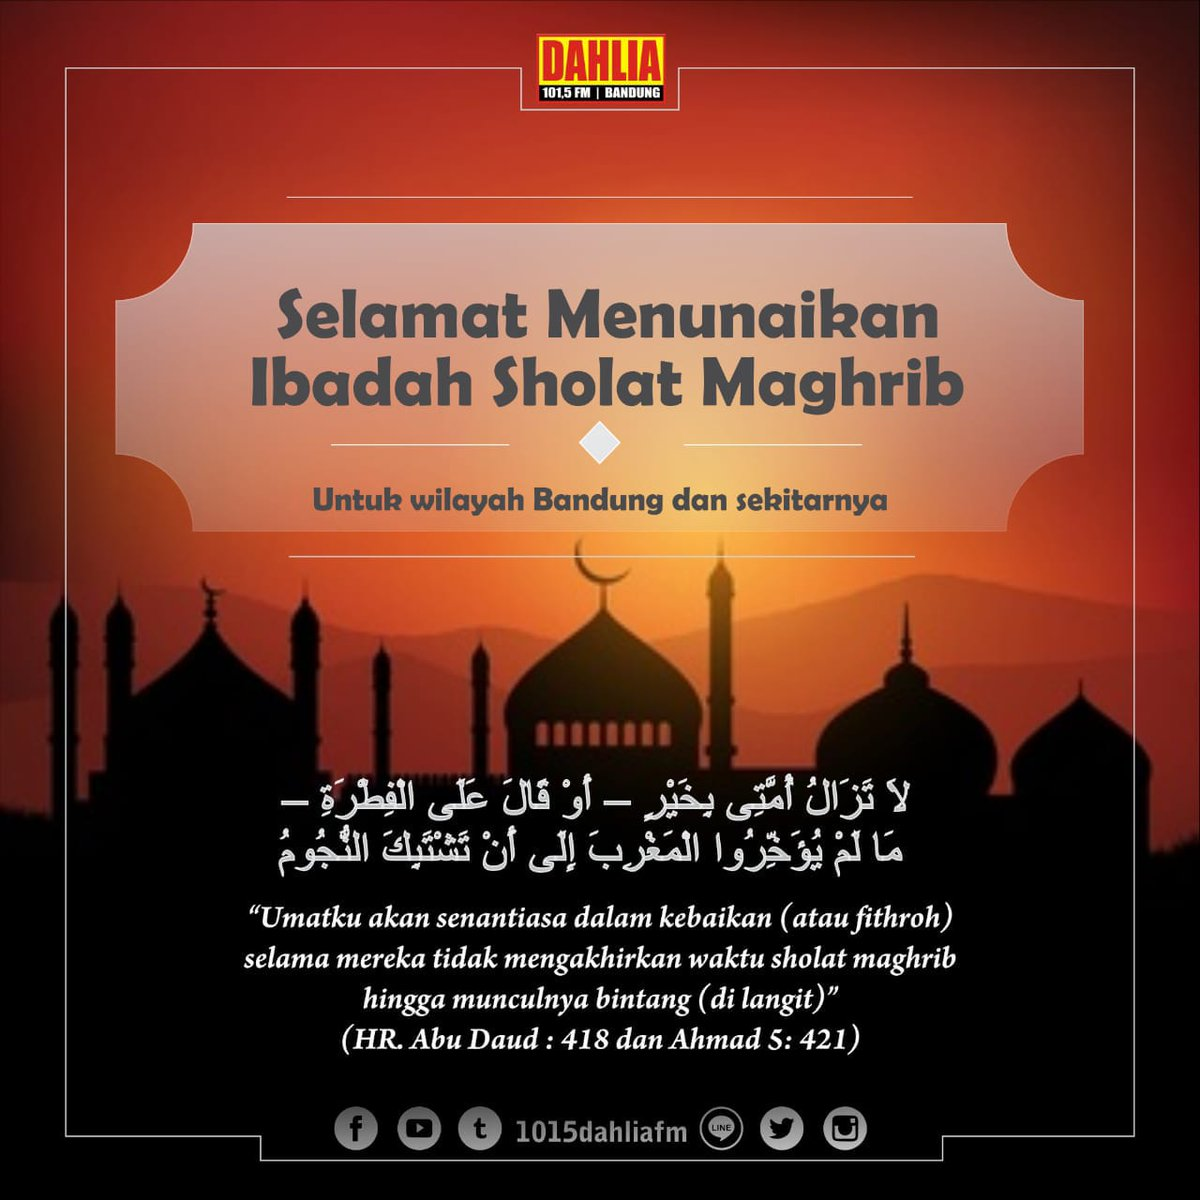 Dahlia Fm Bandung 1015dahliafm Twitter